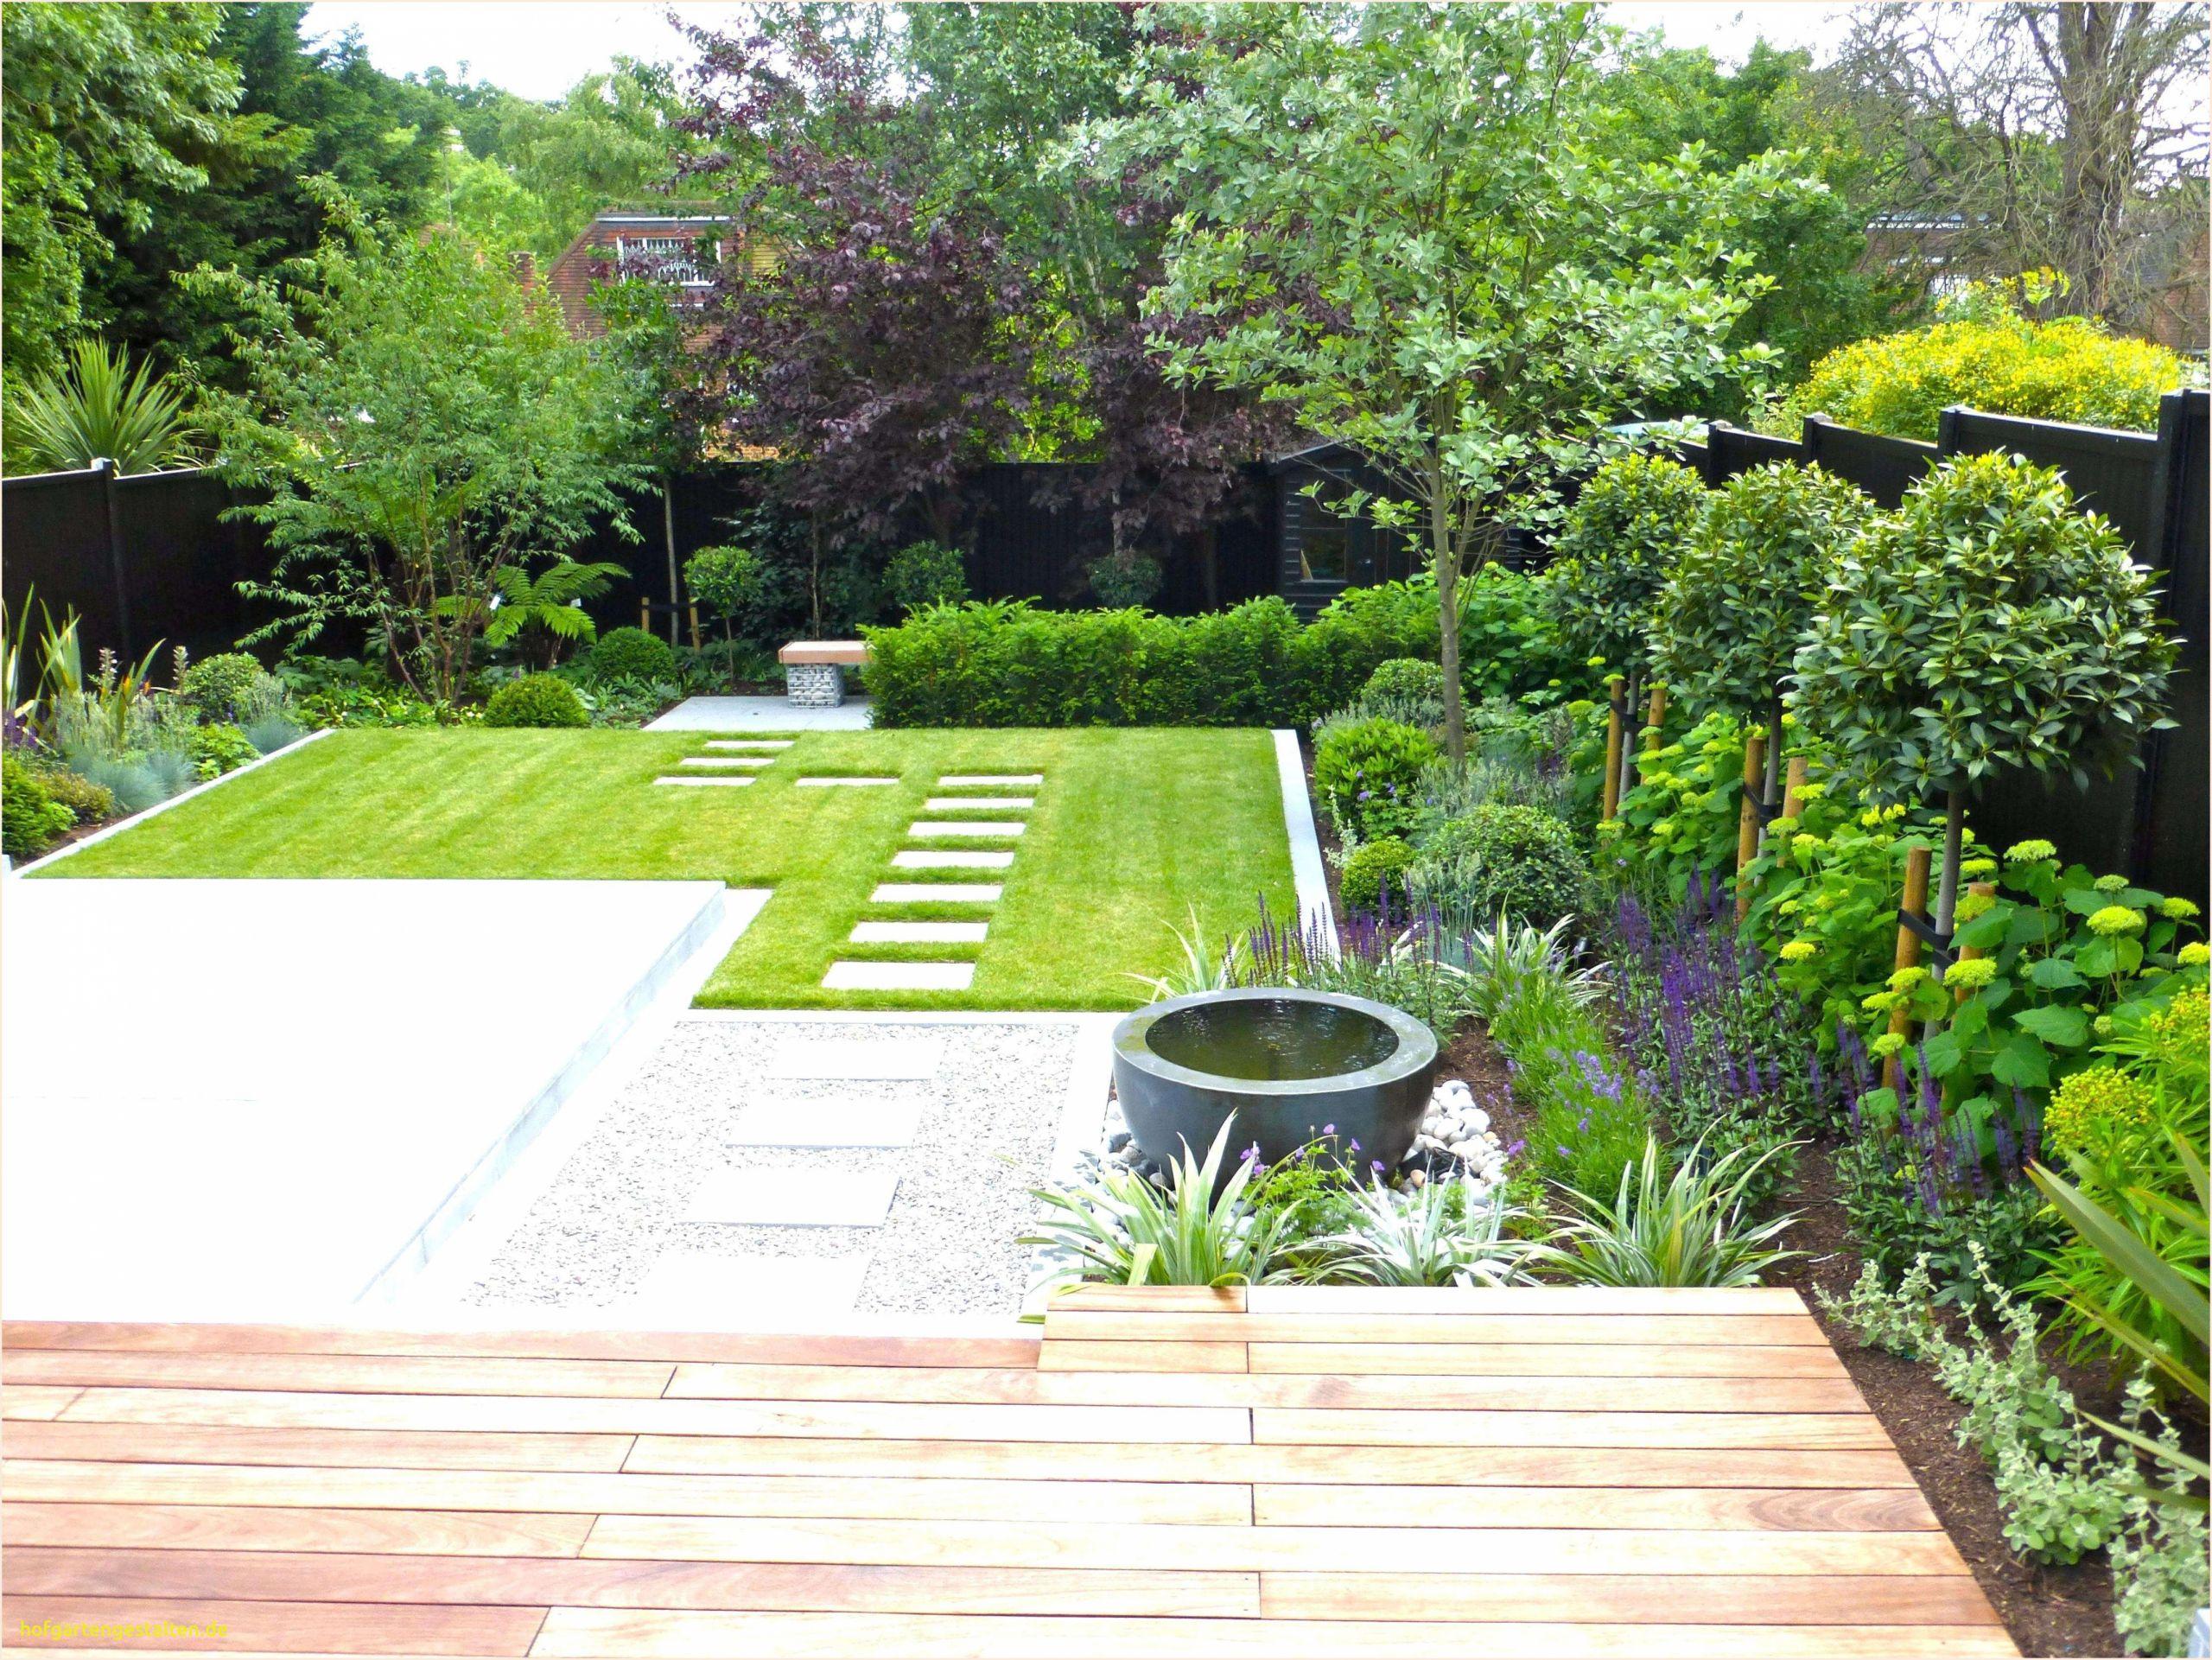 Gartenideen Zum Selber Bauen Best Of Garten Ideen Selber Machen — Temobardz Home Blog